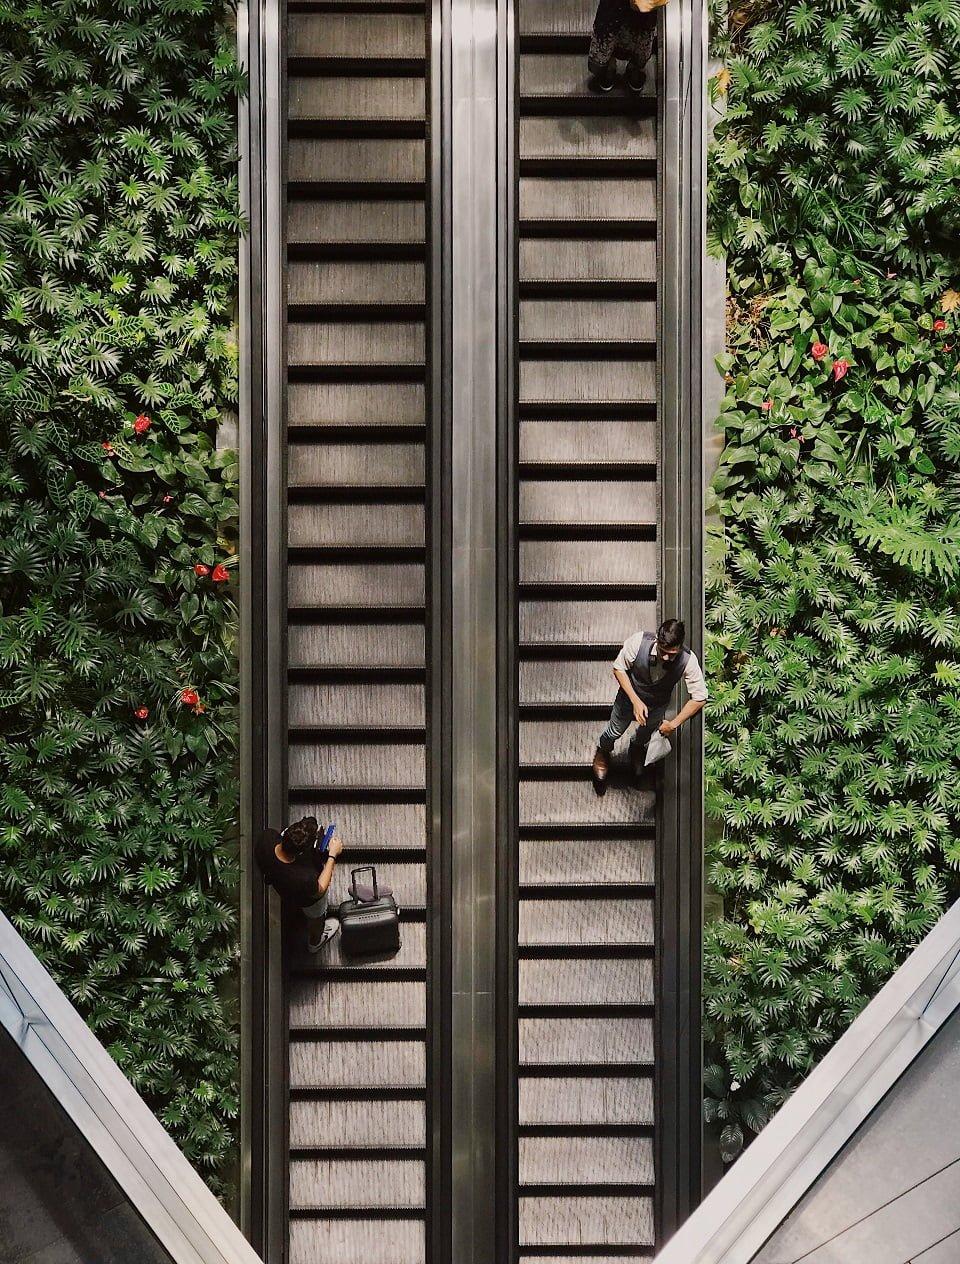 escalator and plants